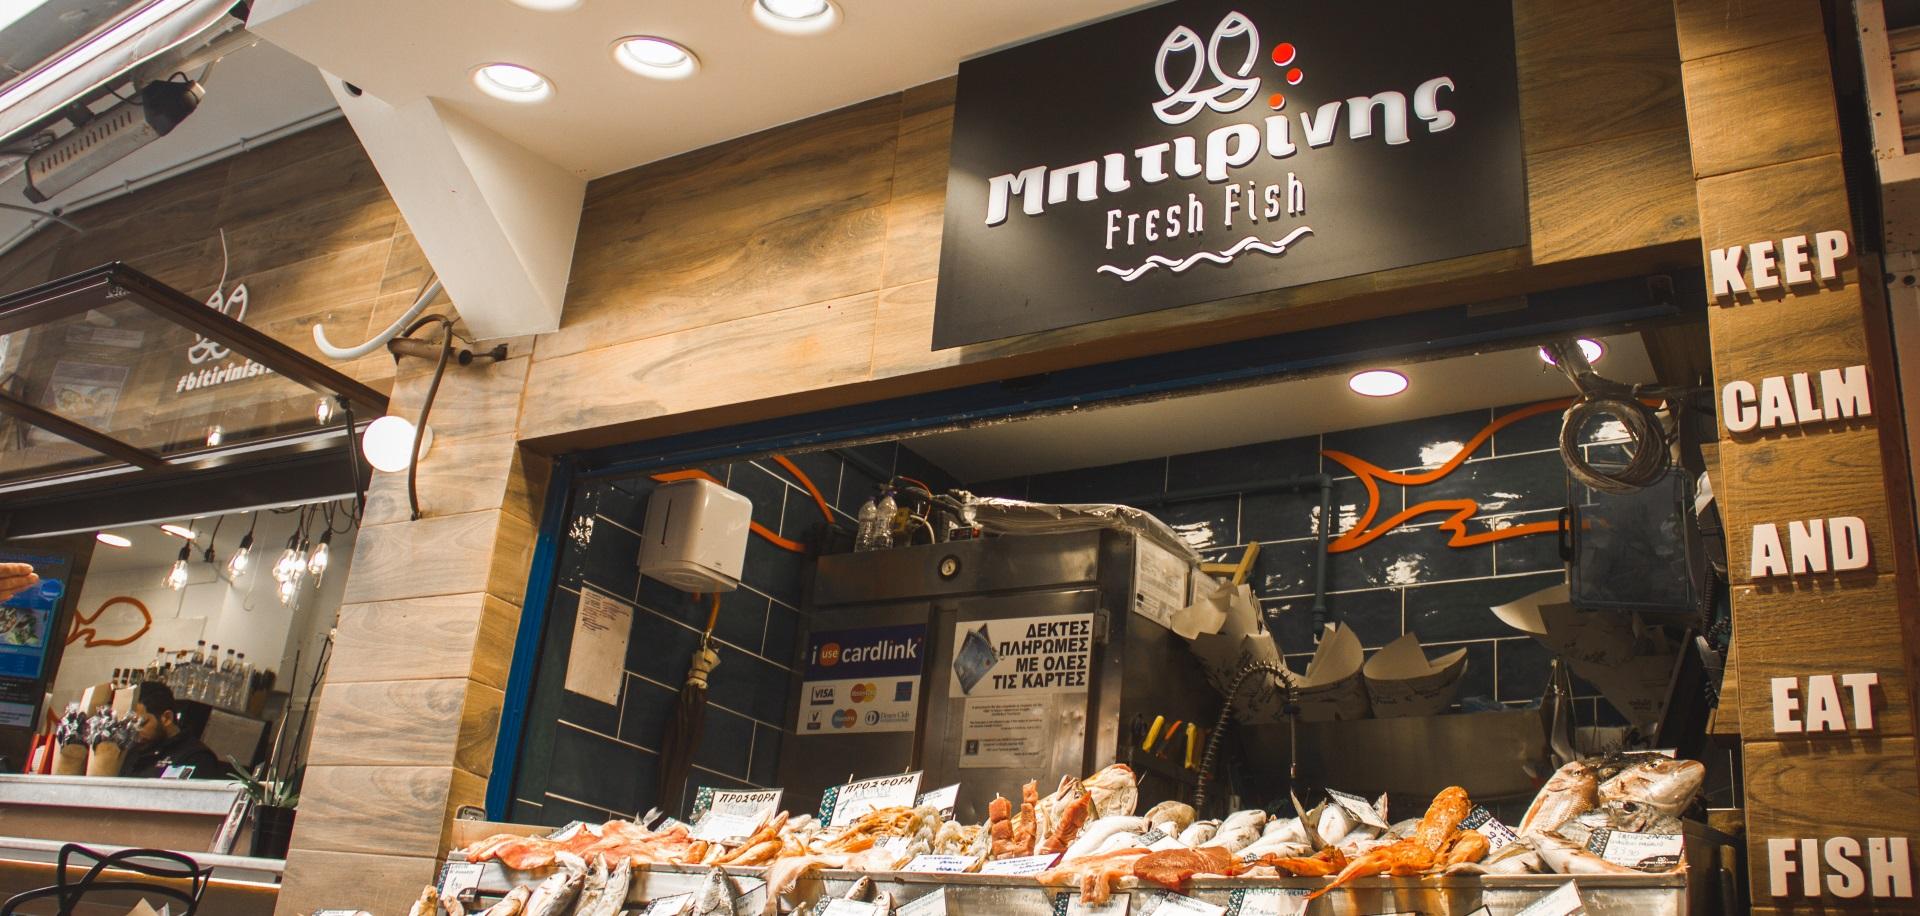 Bitirinis Fish Street Food